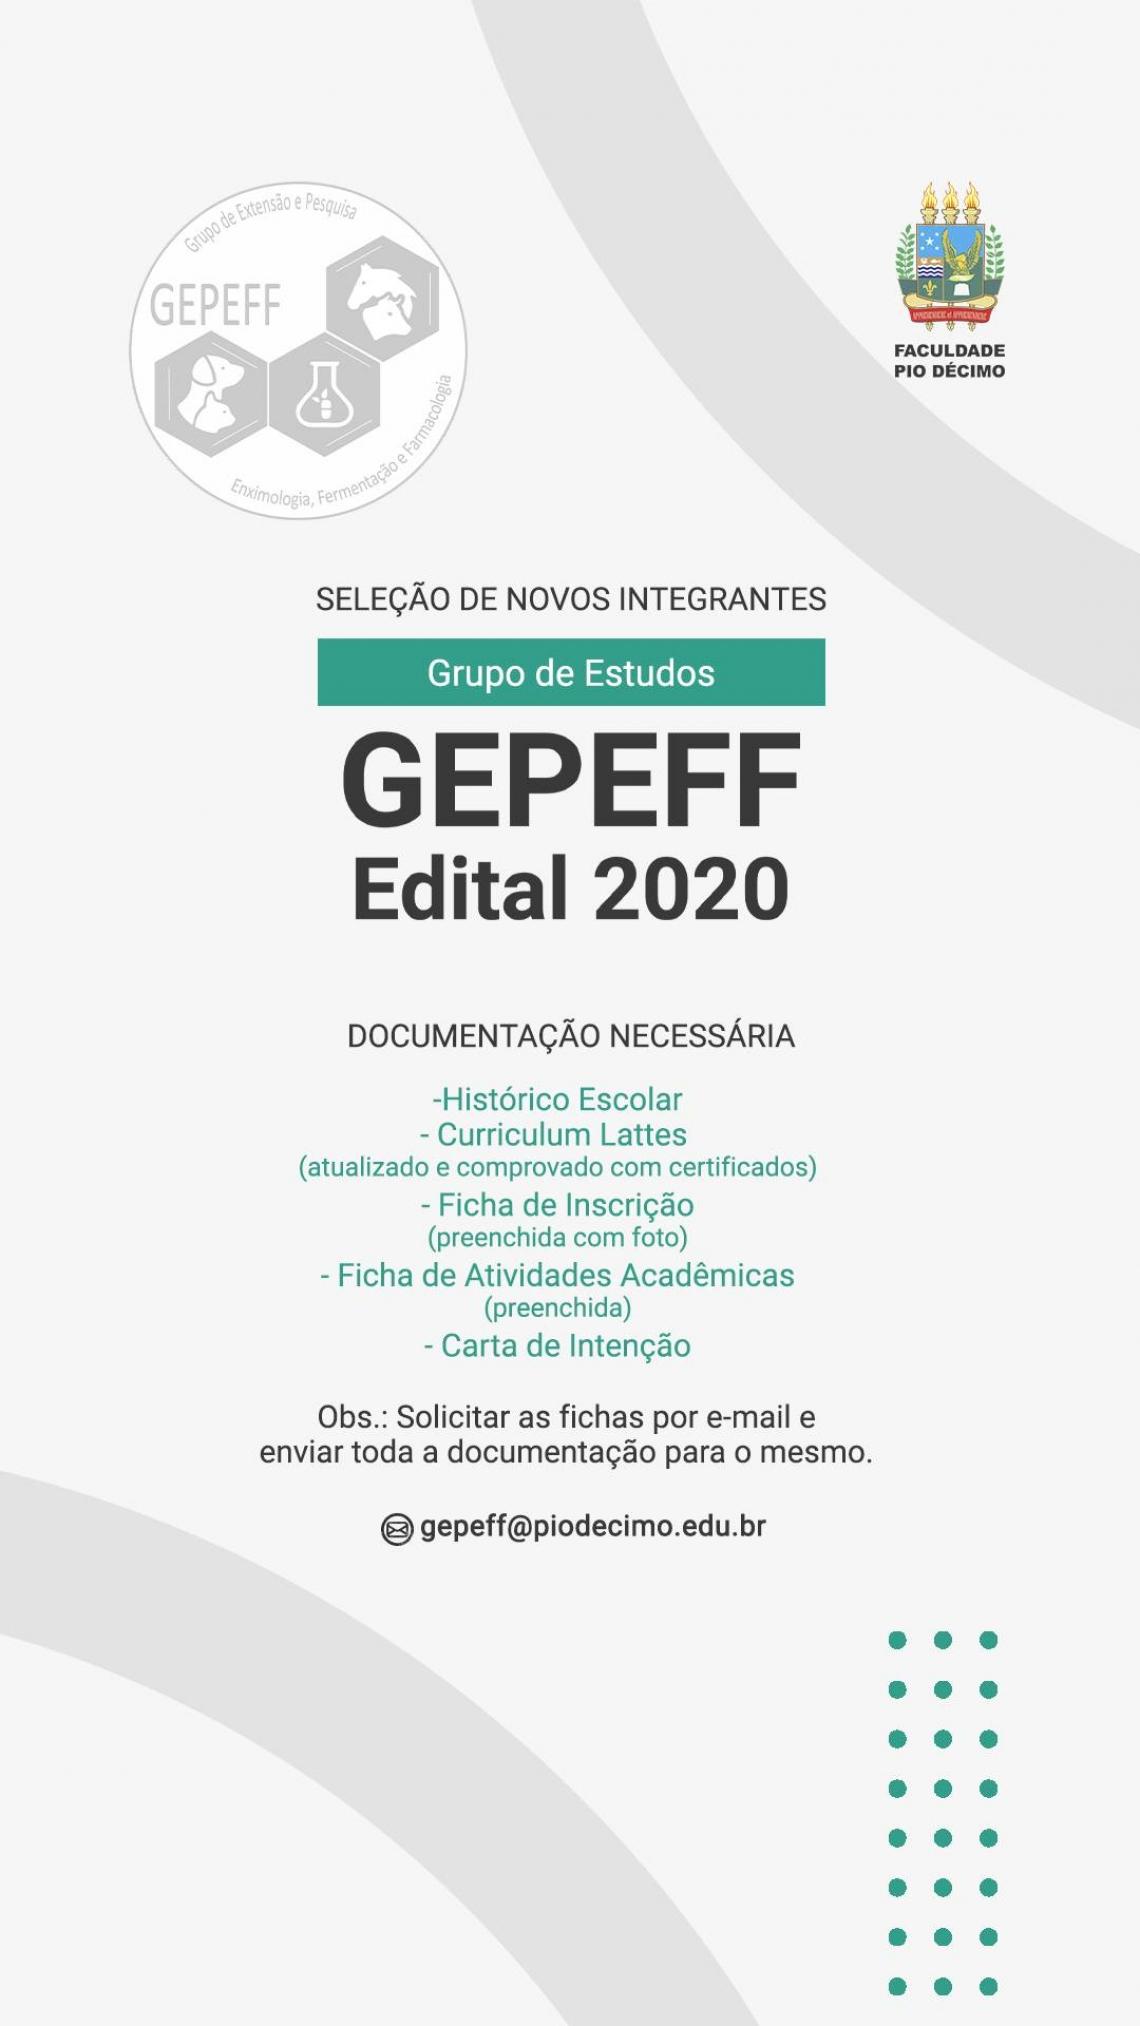 edital-gepeff_3.jpg